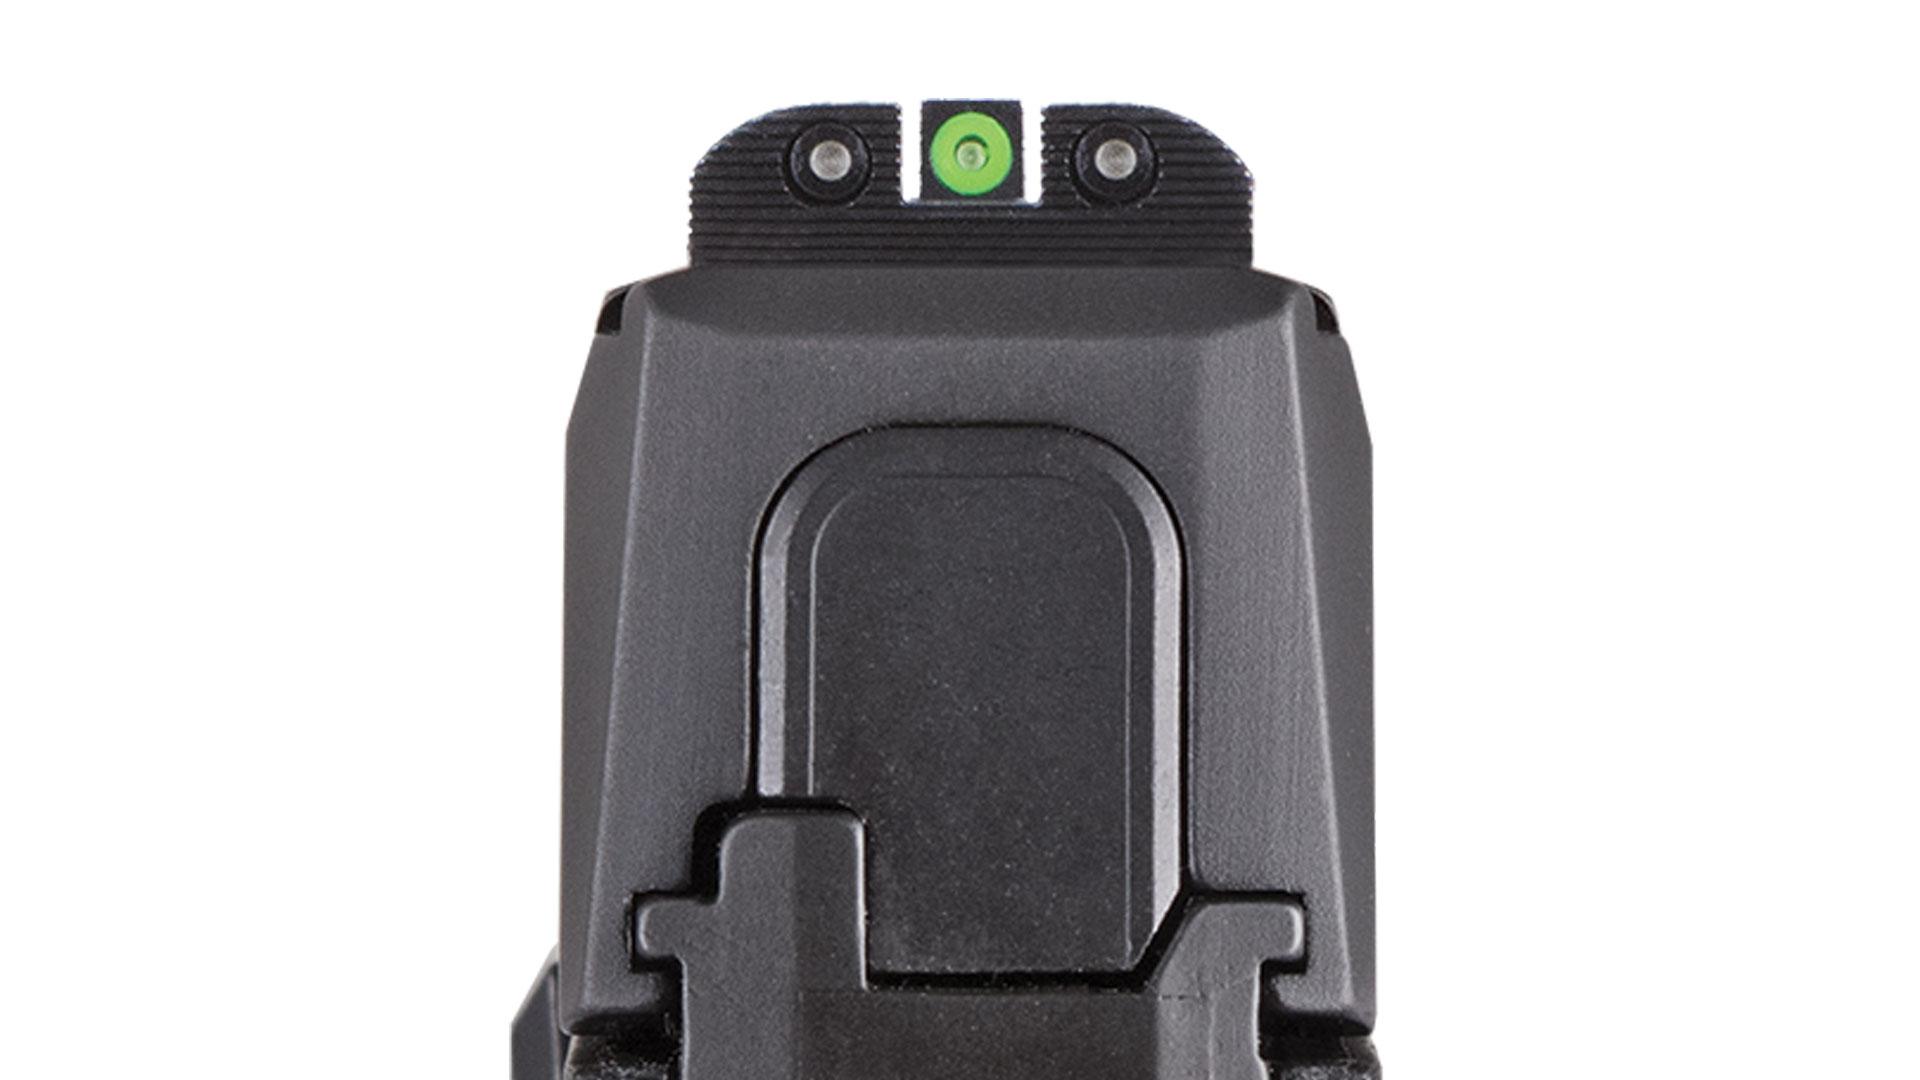 Shooting Review: The Sig Sauer P365 | Eagle Gun Range Inc